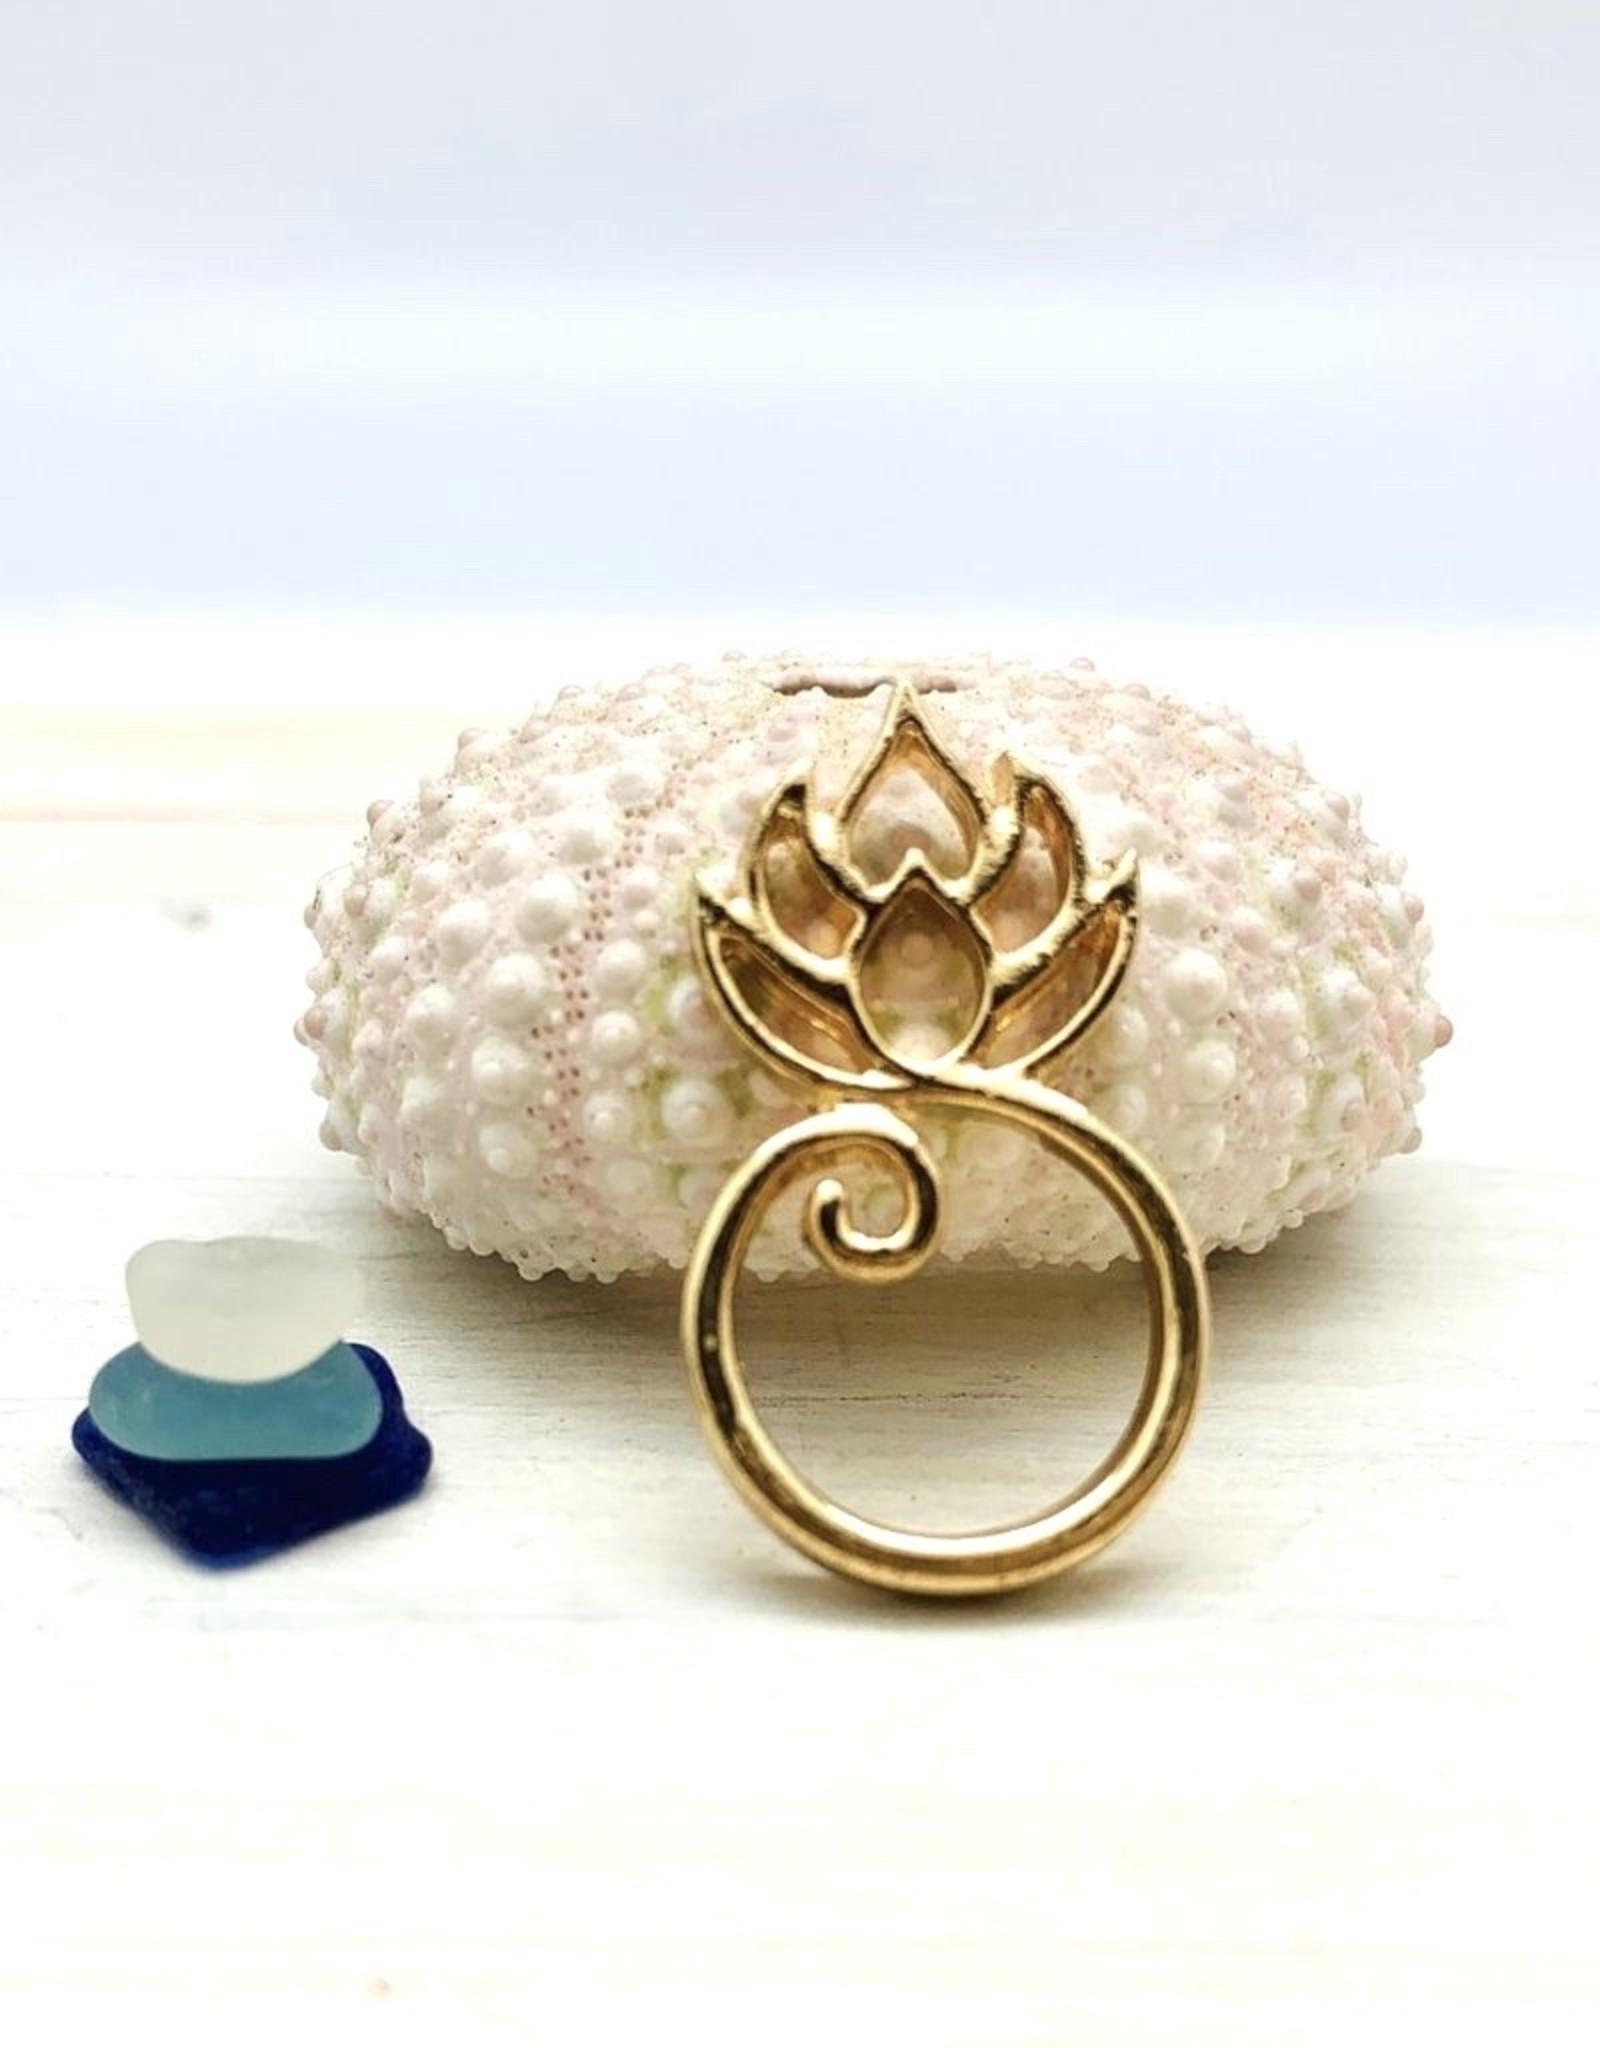 Lotus Charm Holder